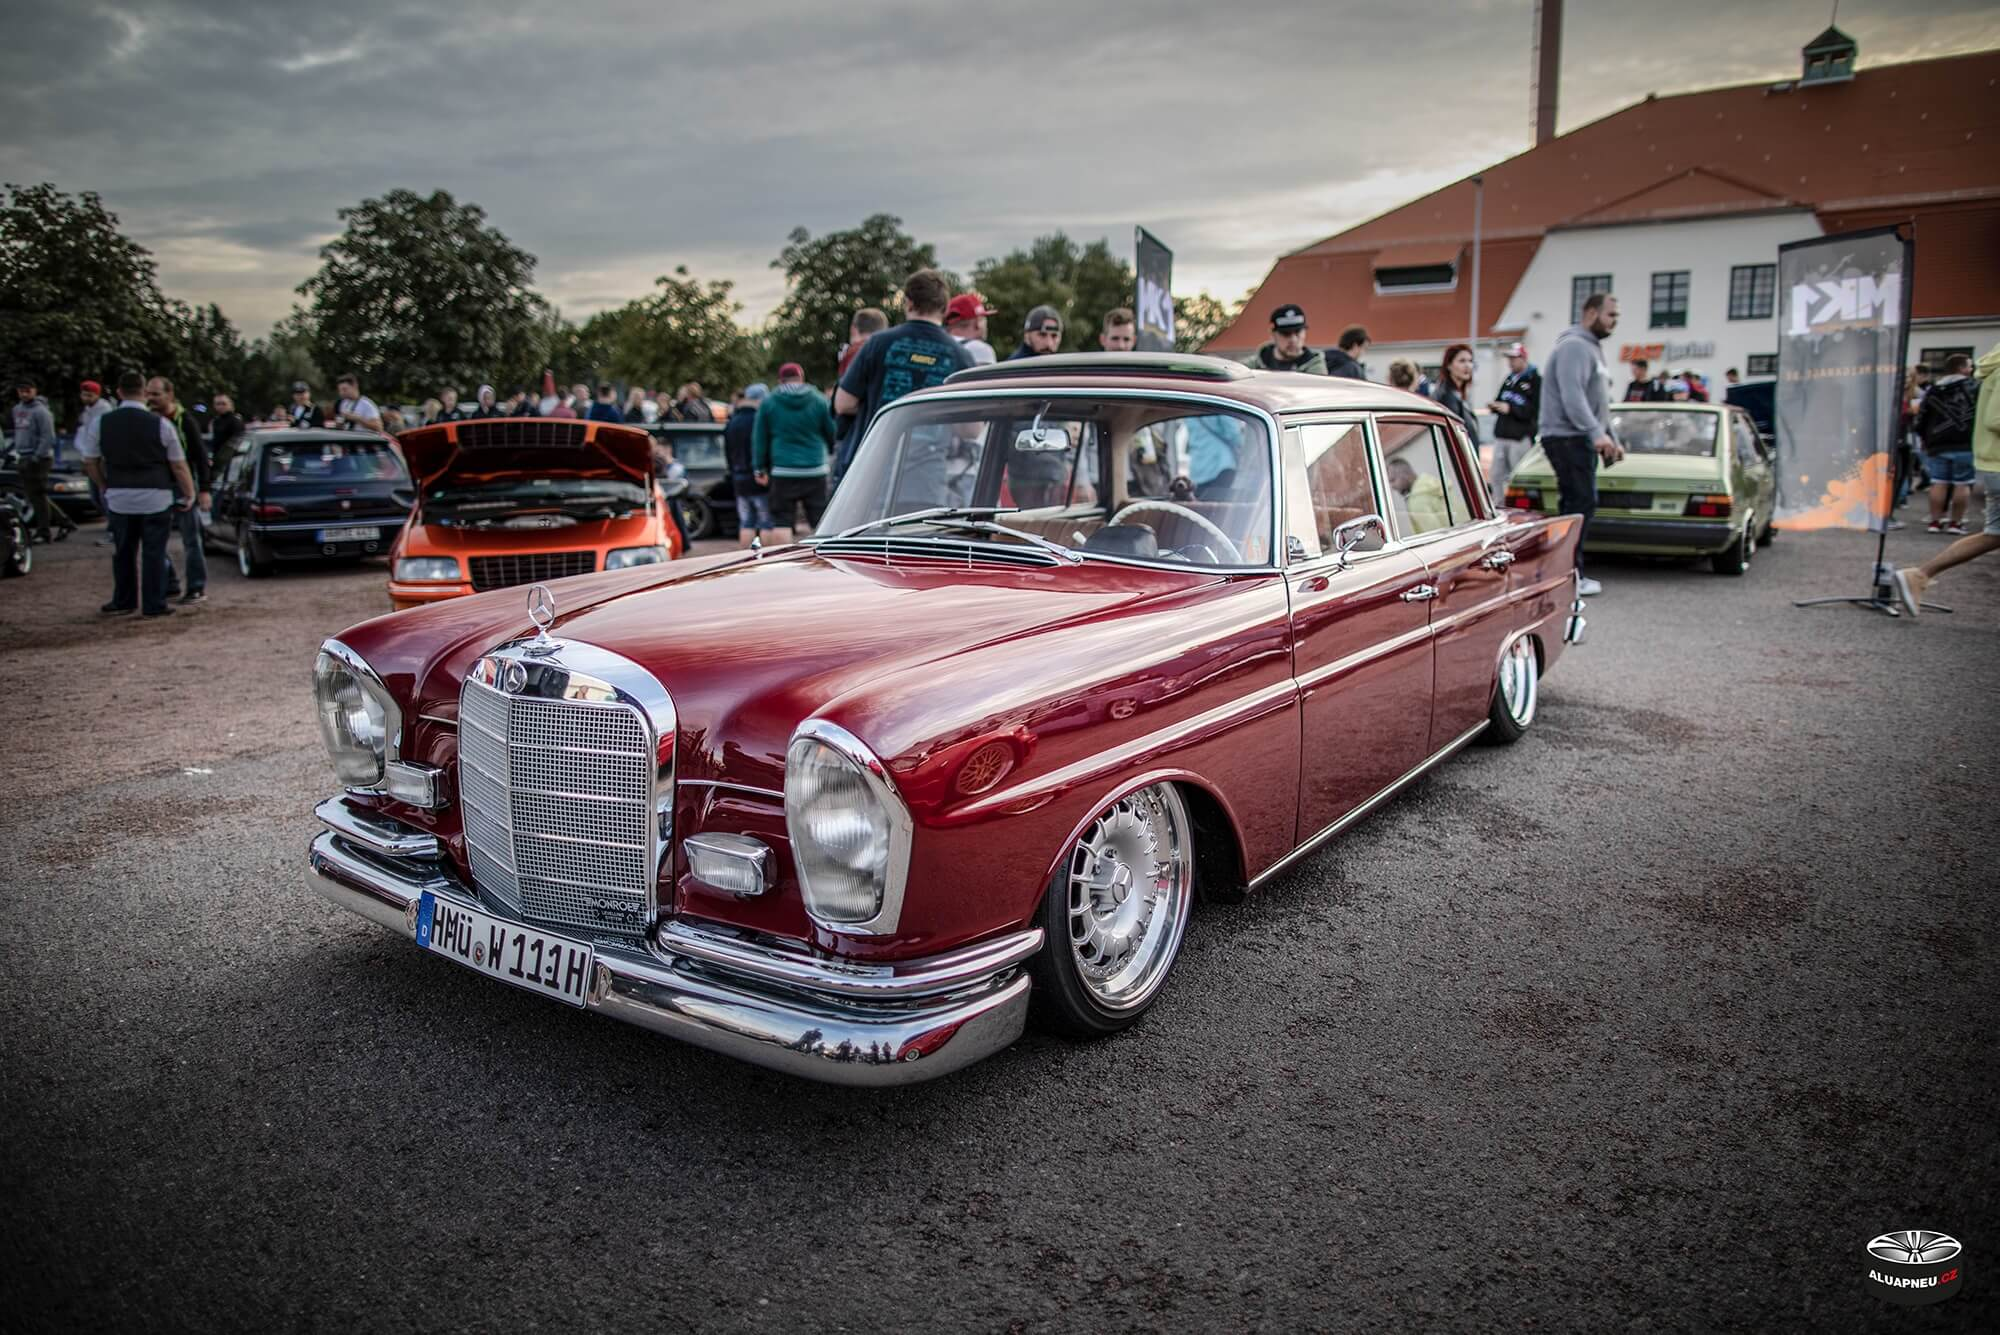 Elektrony s límcem Mercedes 220 sb - XS Classic Carnight 5.0 - Drážďany tuning sraz 2019 - www.aluapneu.cz